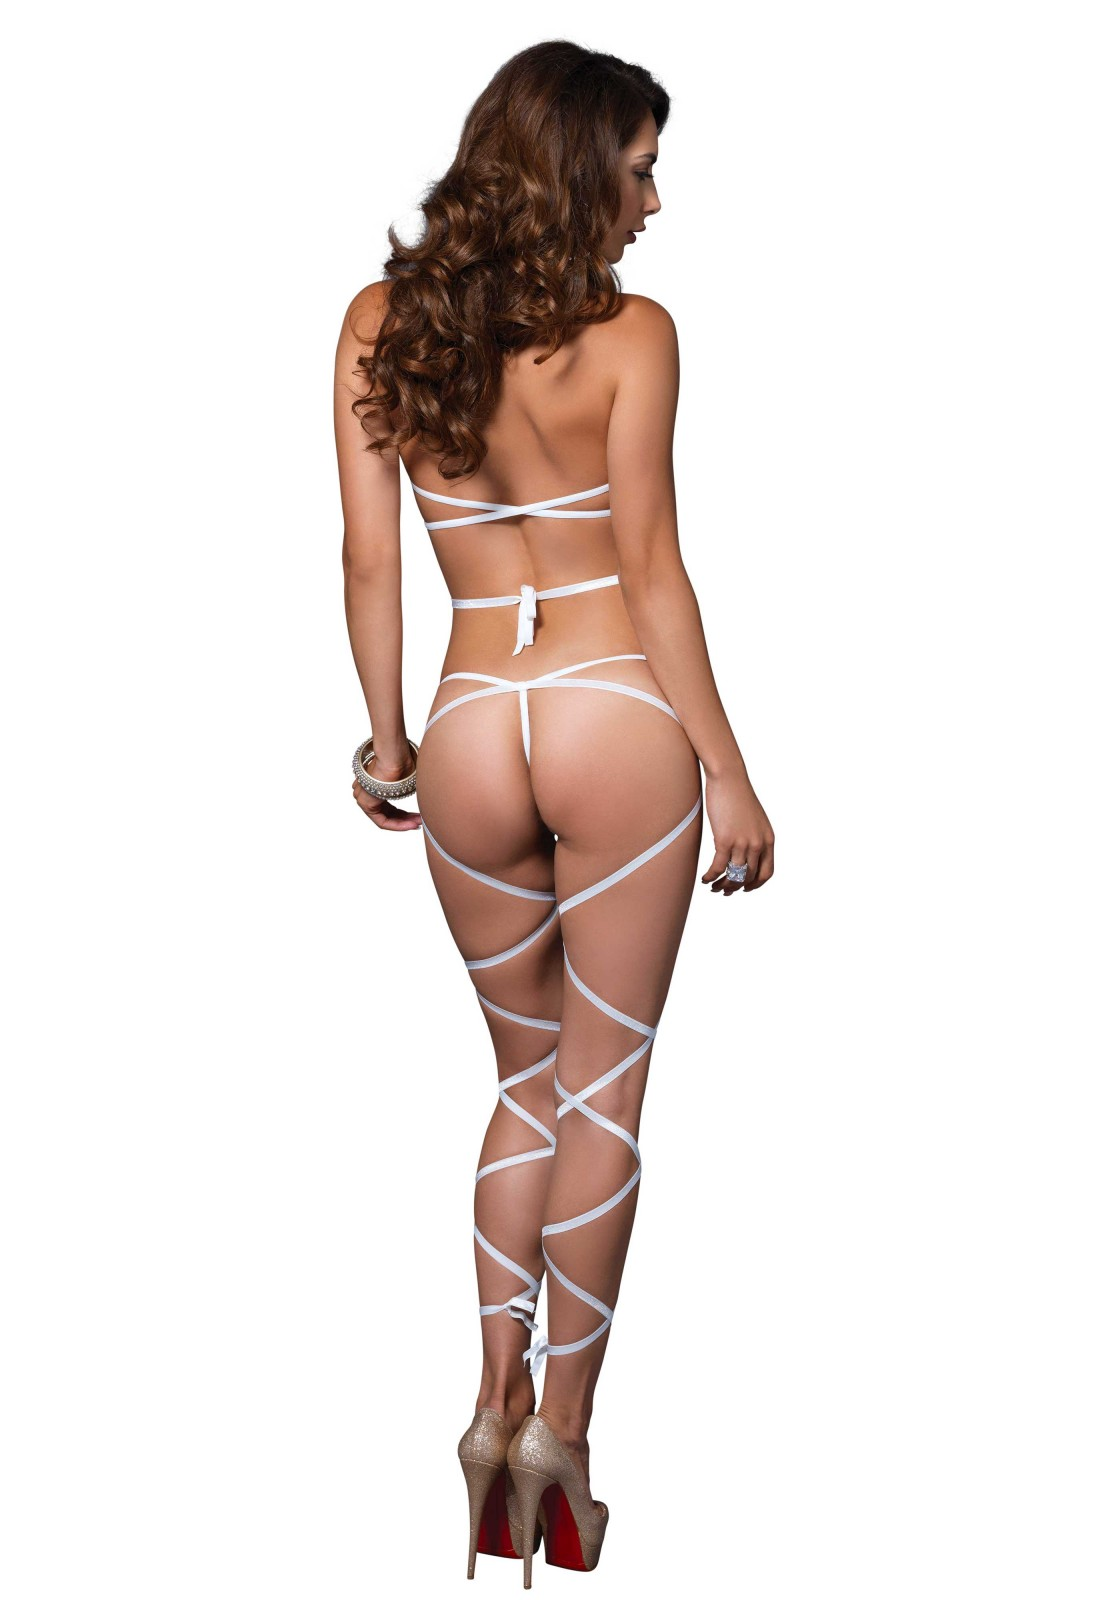 2 PC. Wrap around fishnet halter top and g-string leg wrap.